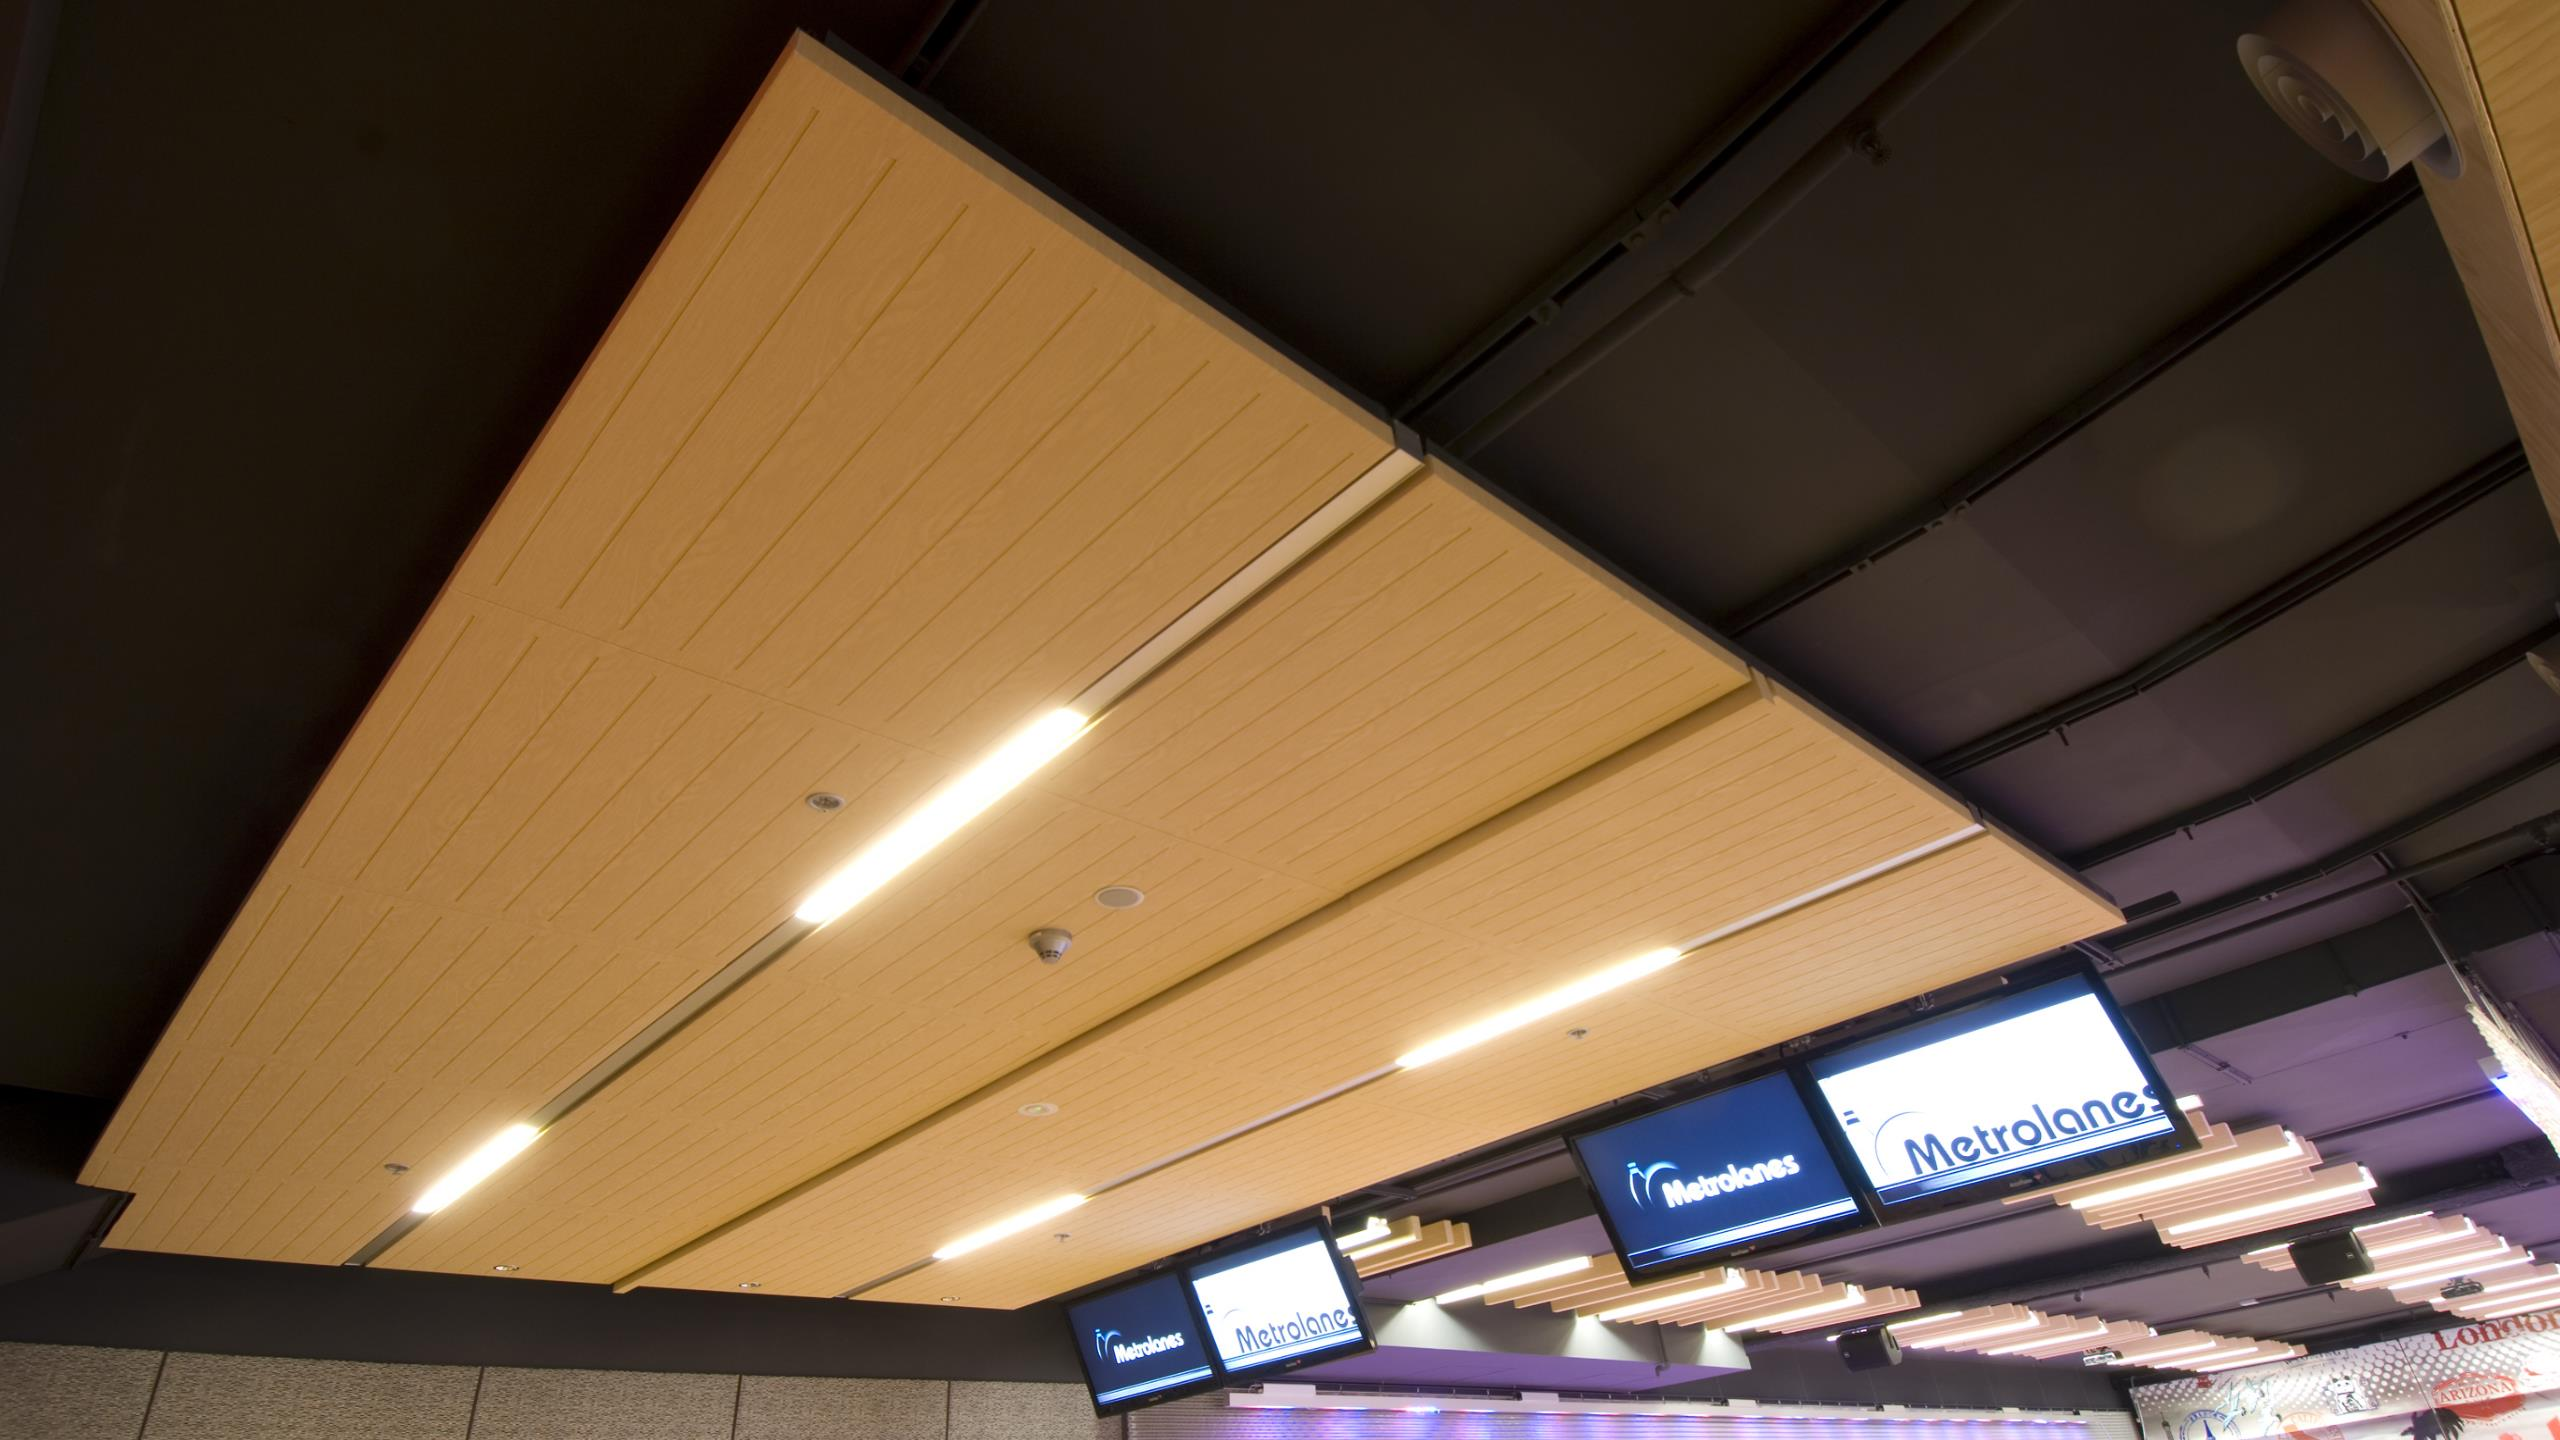 Metro Bowling Alley, AKLD - Triton Cloud 50 + wood-grain Sonaris